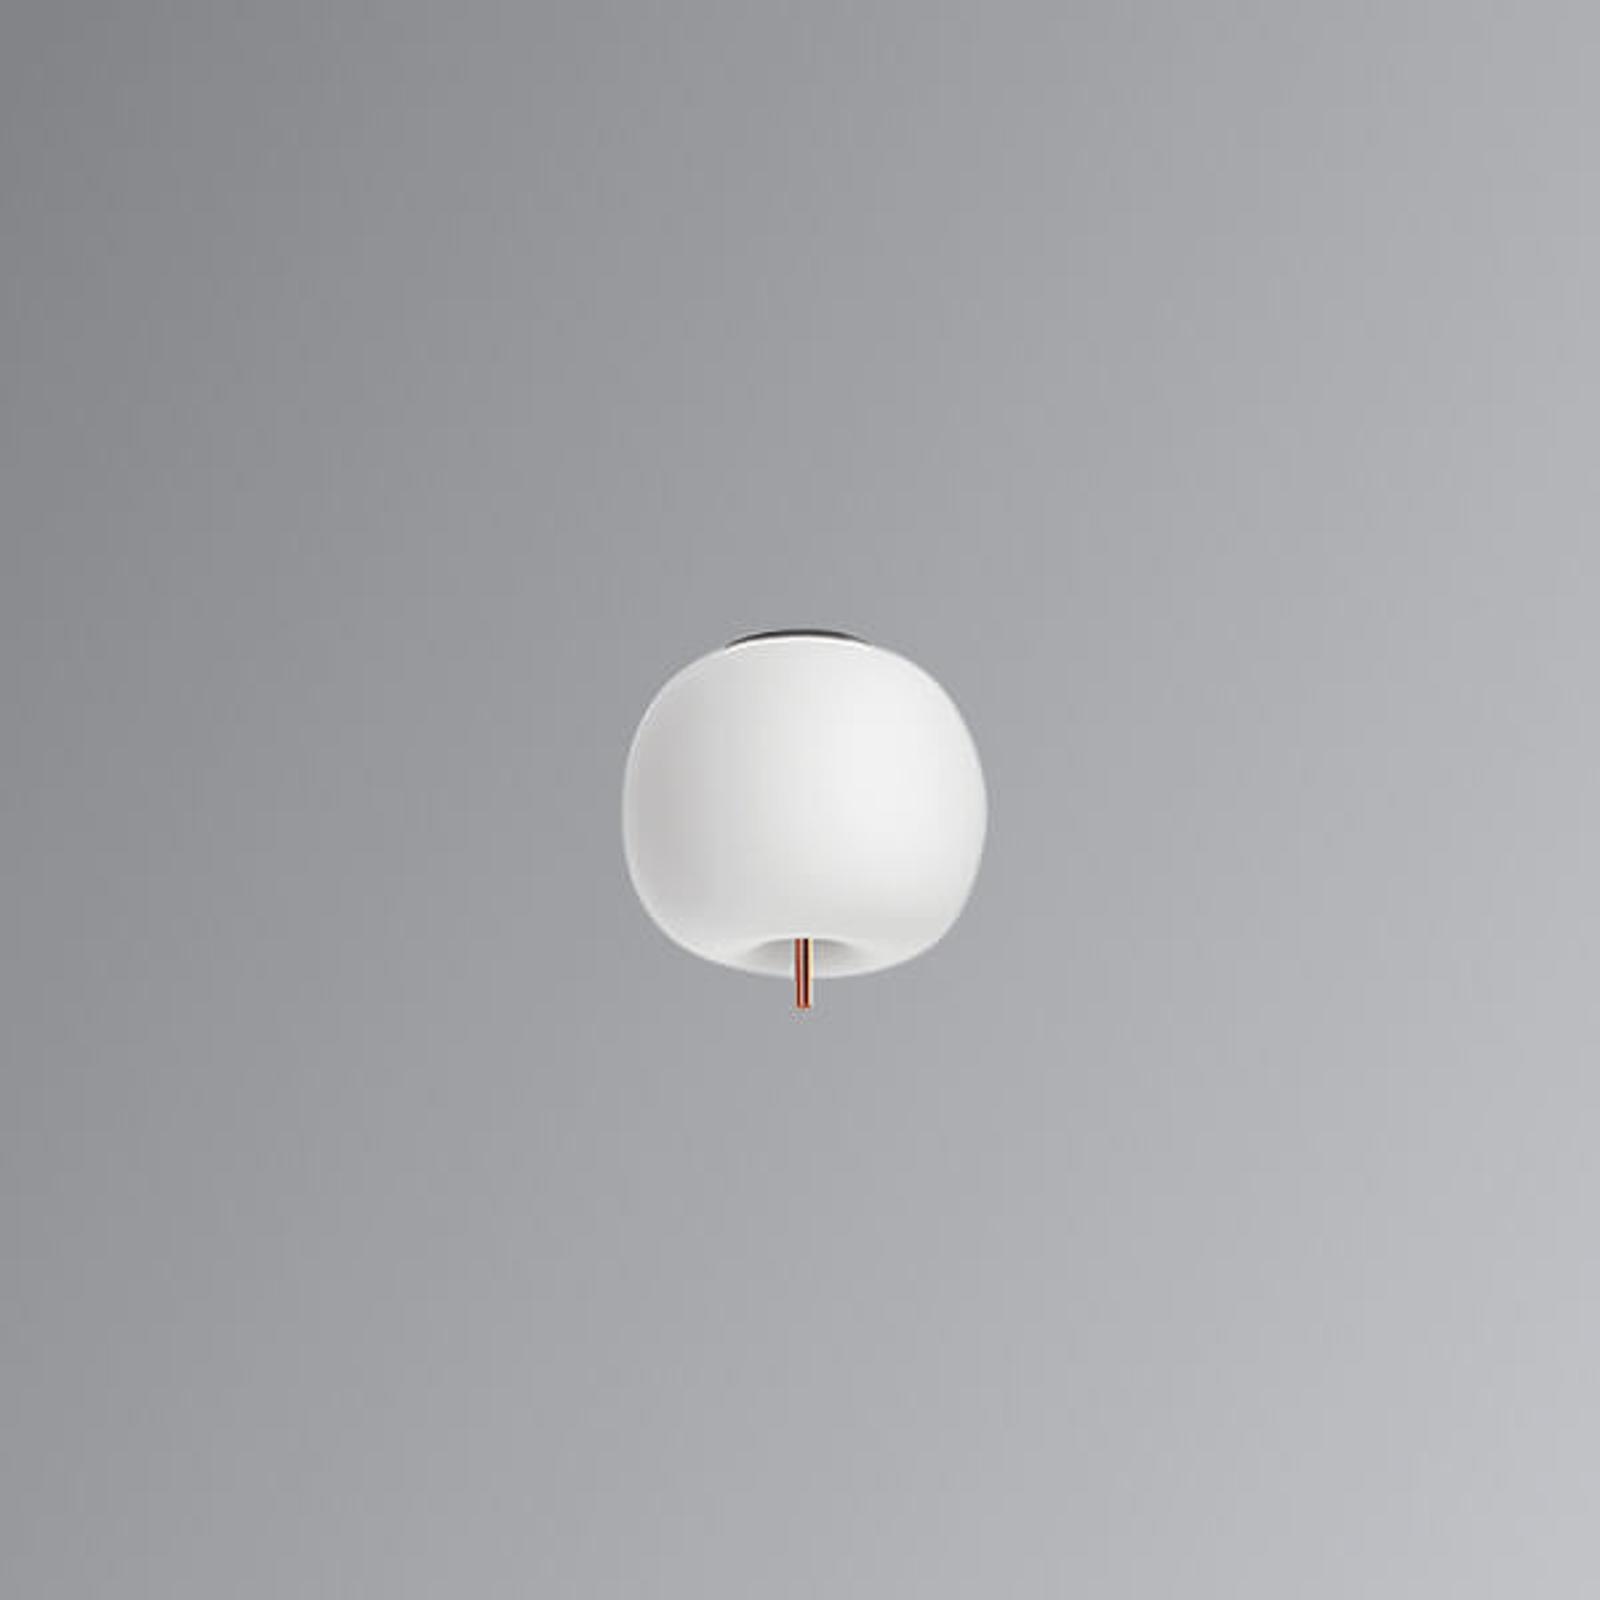 Plafoniera LED Kushi con asta di rame 16